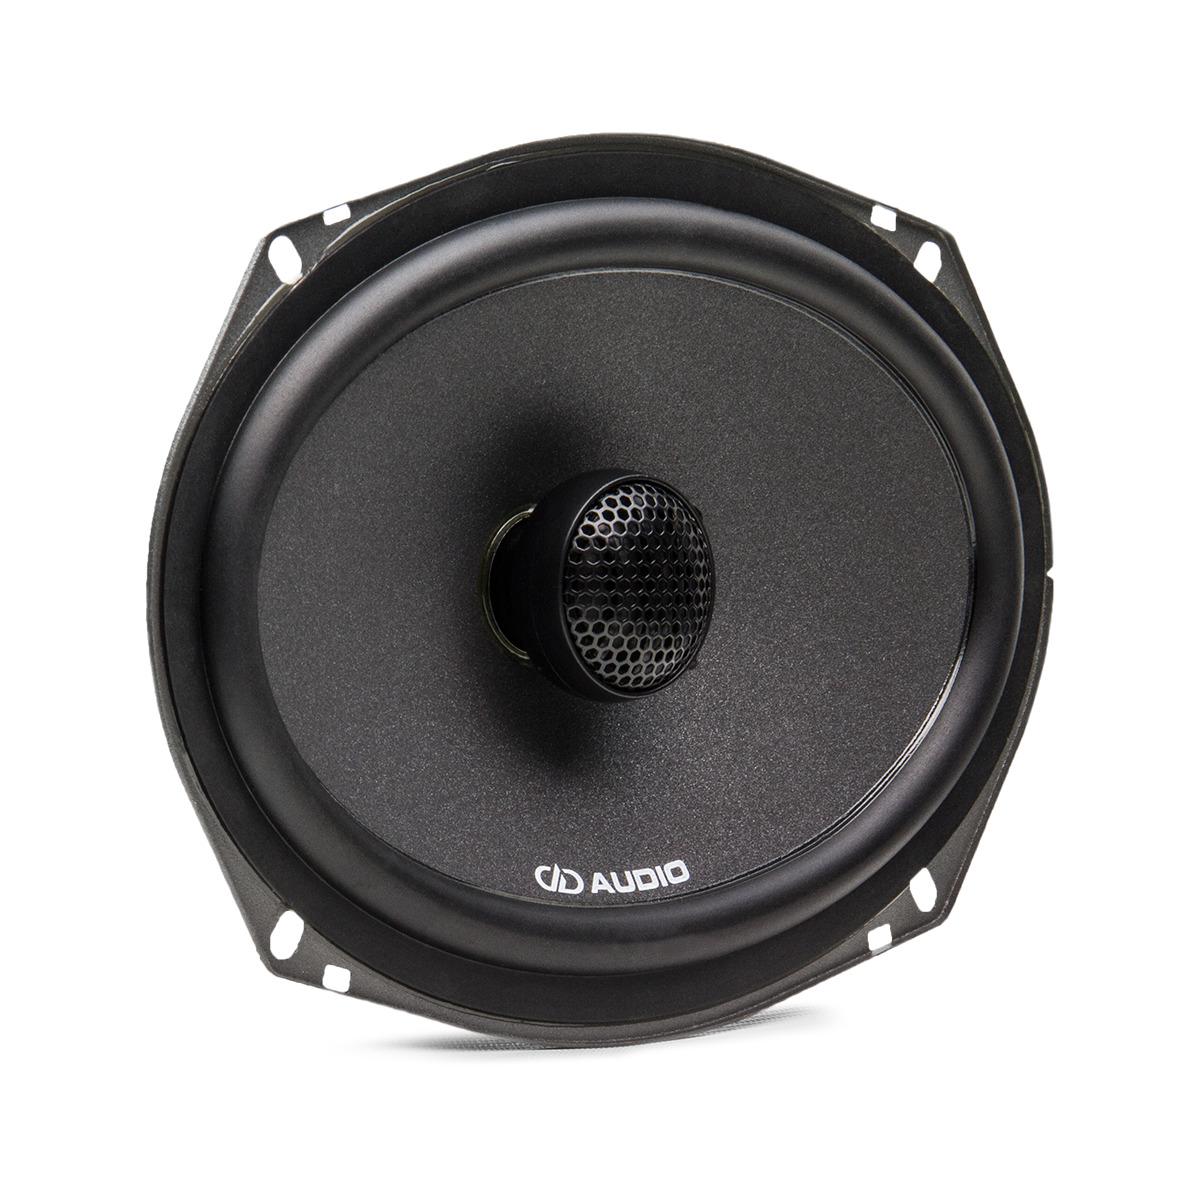 "DD Audio DX6X9 6X9"" S4 Speaker -"